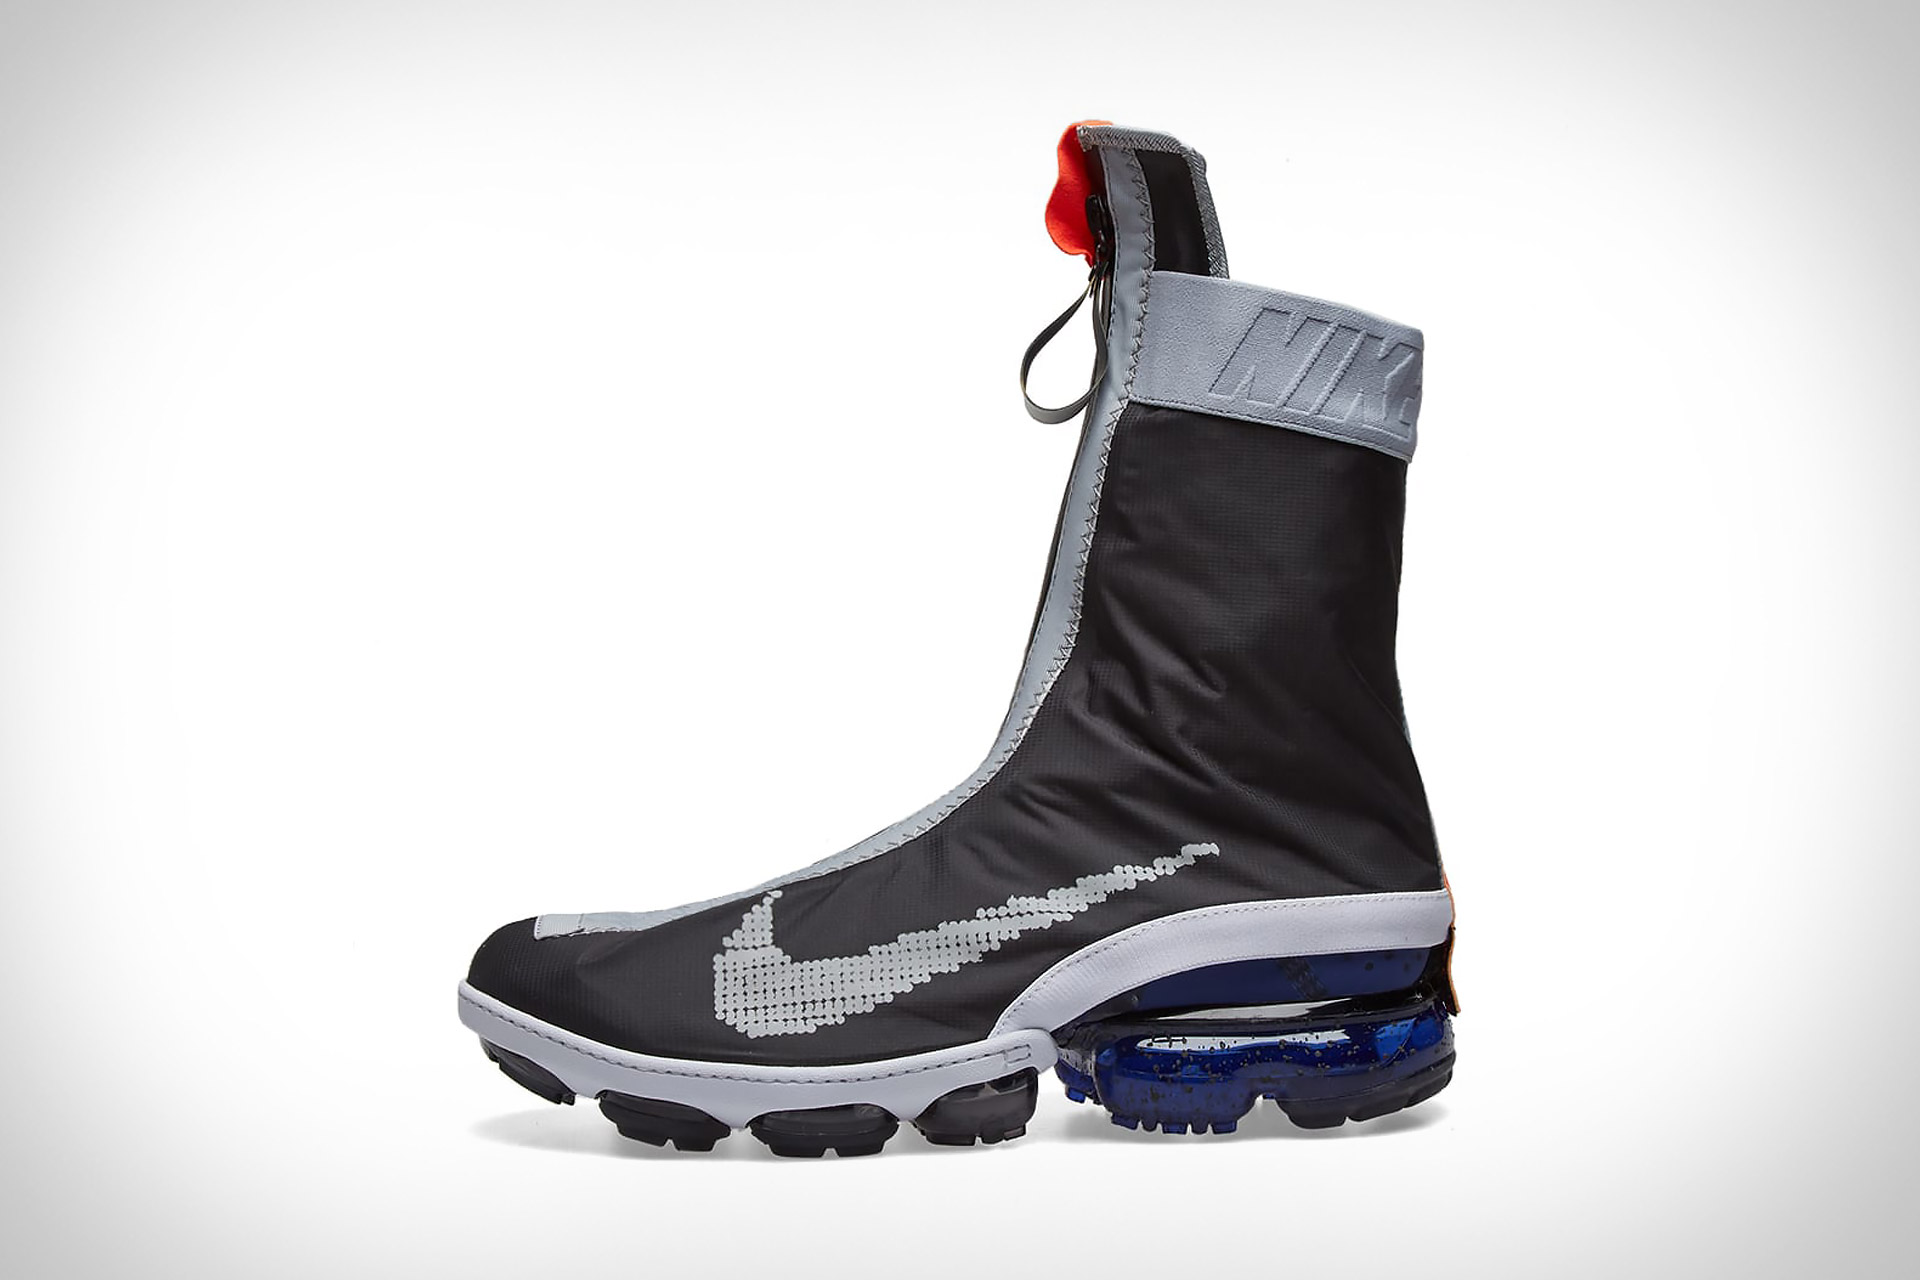 Zapatillas Nike Air Vapormax Flyknit Gaiter ISPA   Uncrate